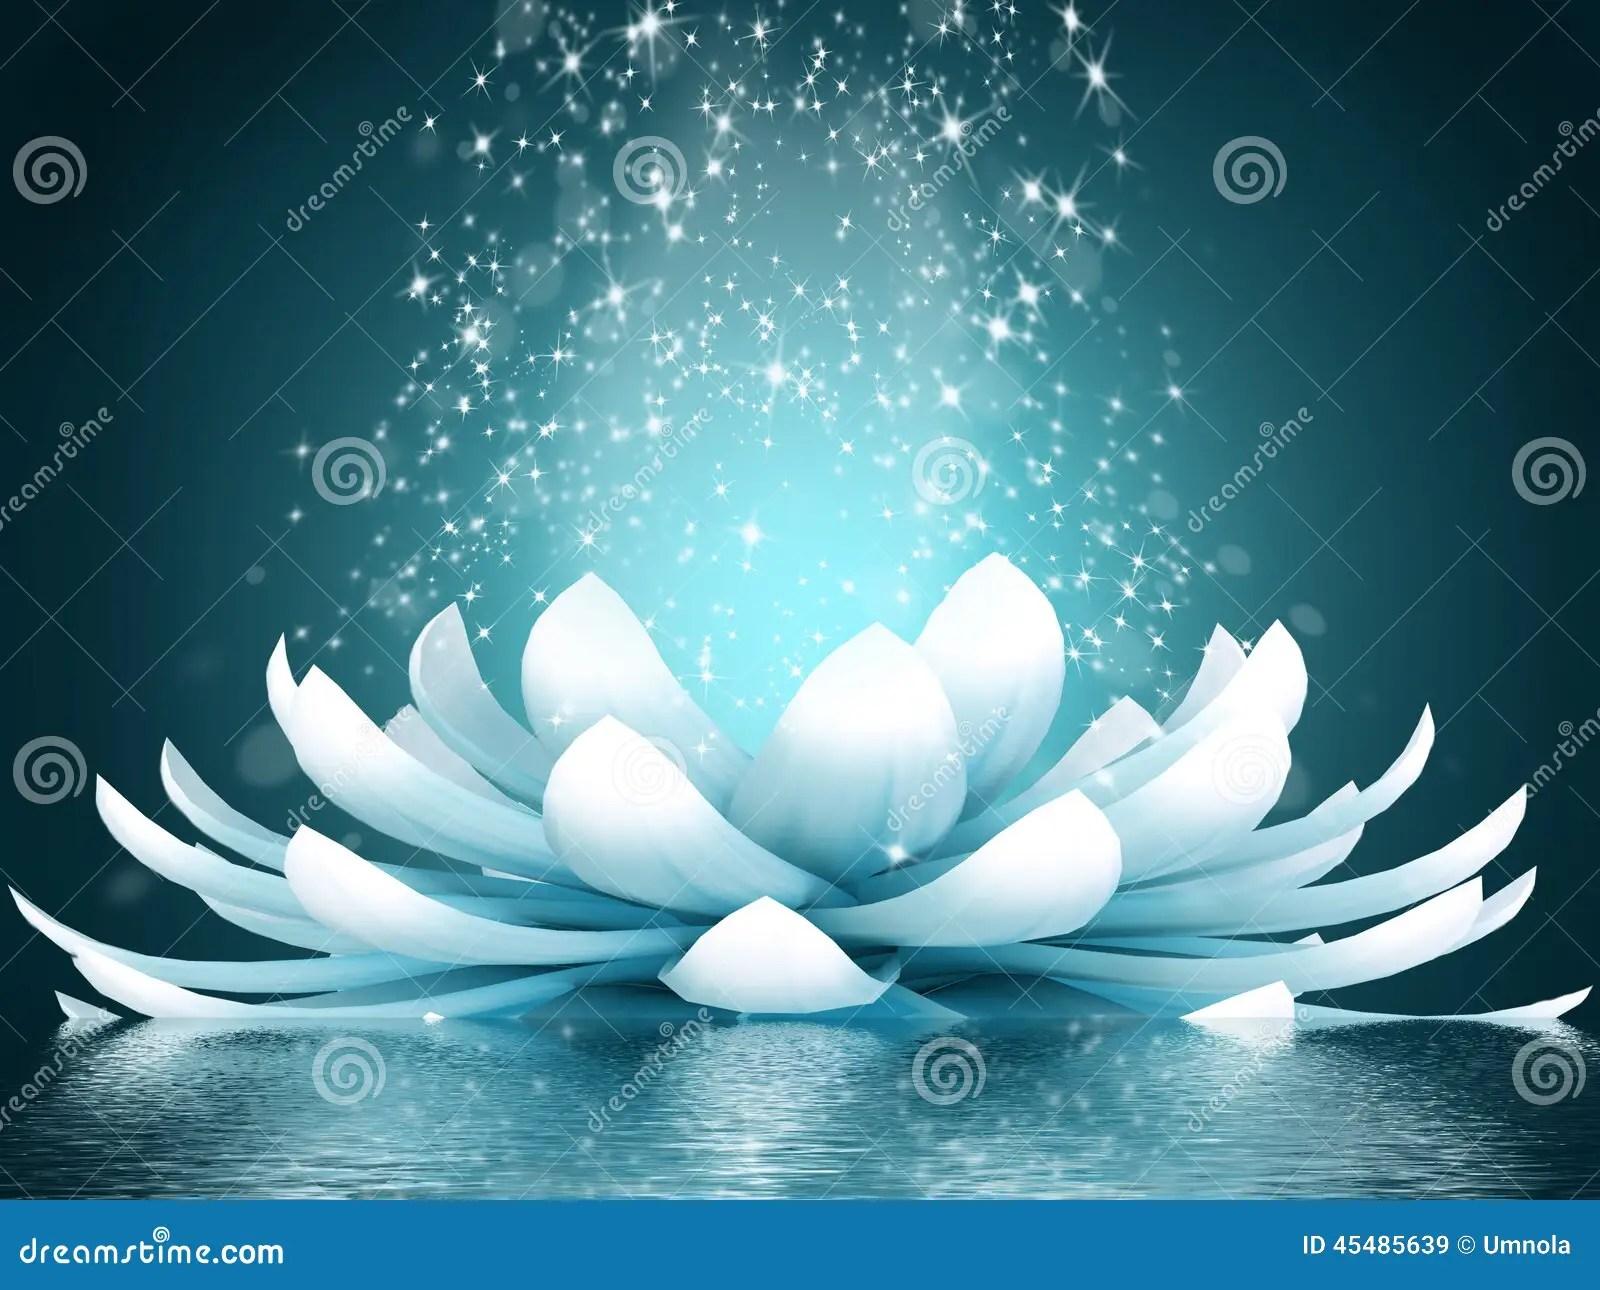 Pond Wallpaper Hd Beautiful Lotus Flower Stock Illustration Illustration Of